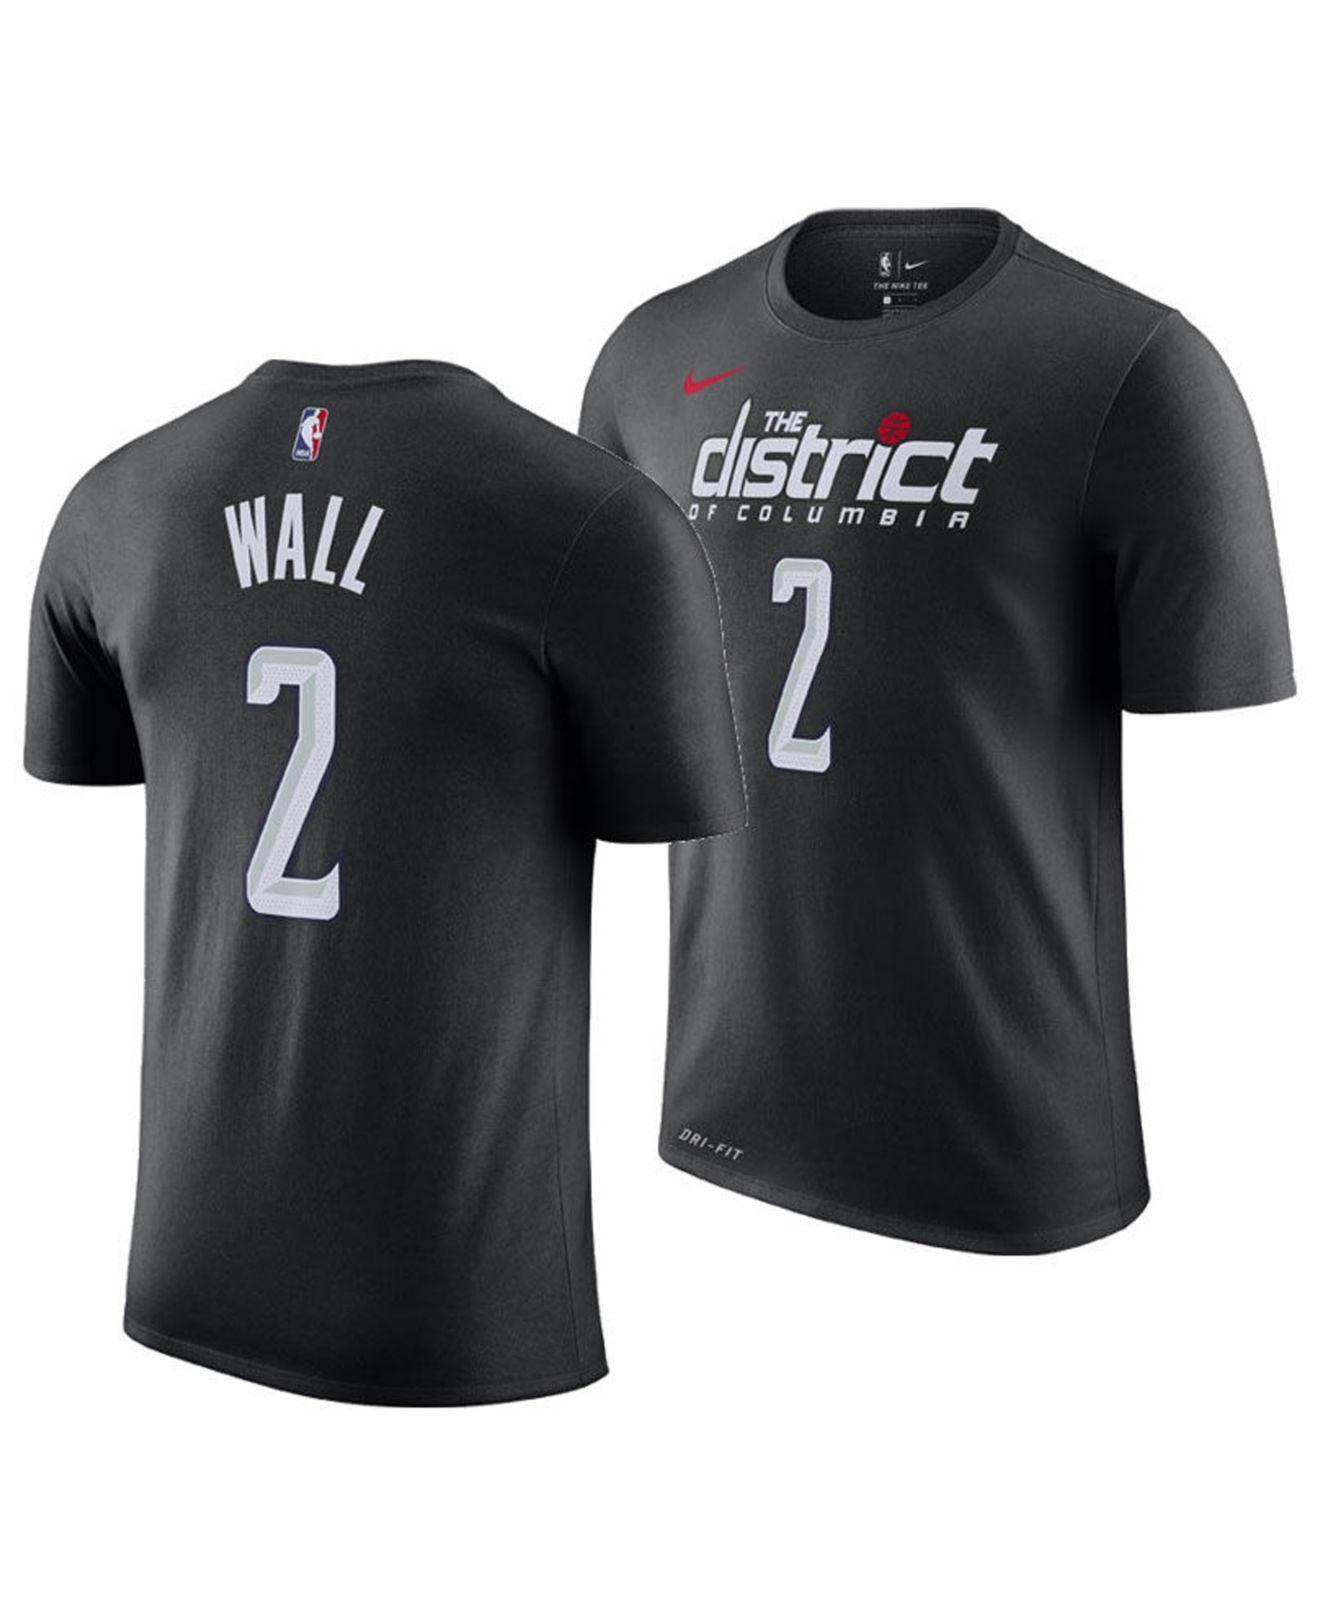 Lyst - Nike John Wall Washington Wizards City Player T-shirt 2018 in ... 8a24d21f0